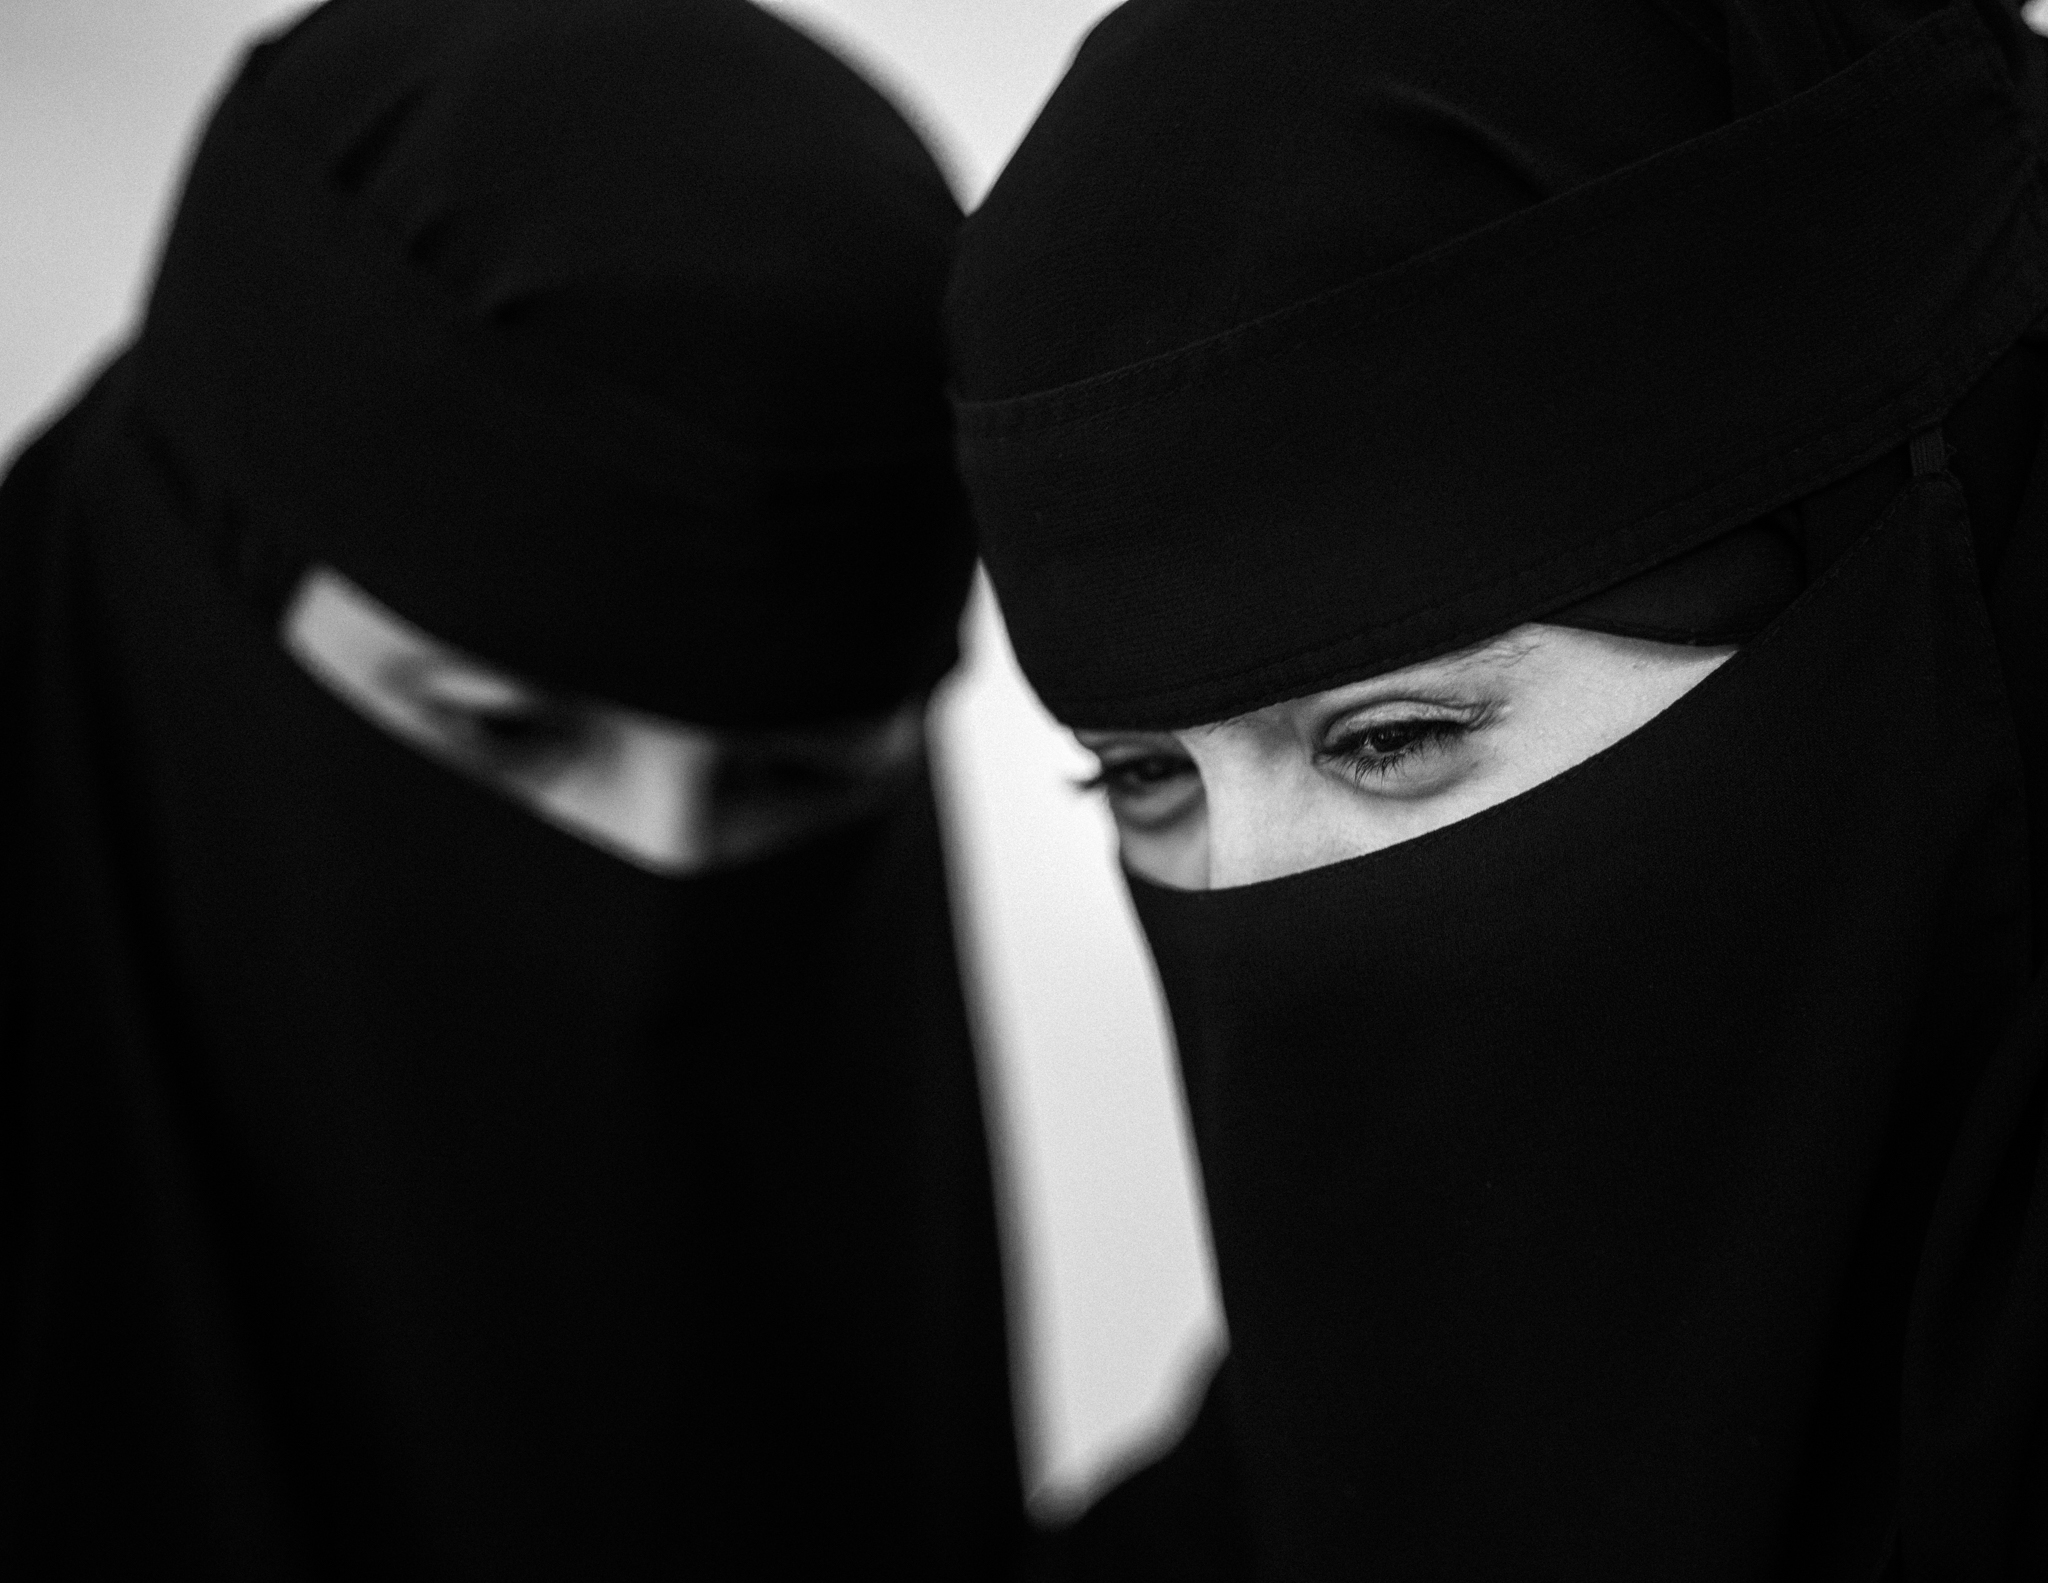 Real Smiles - Saudi Arabia  Tatan Zuleta - 2019©